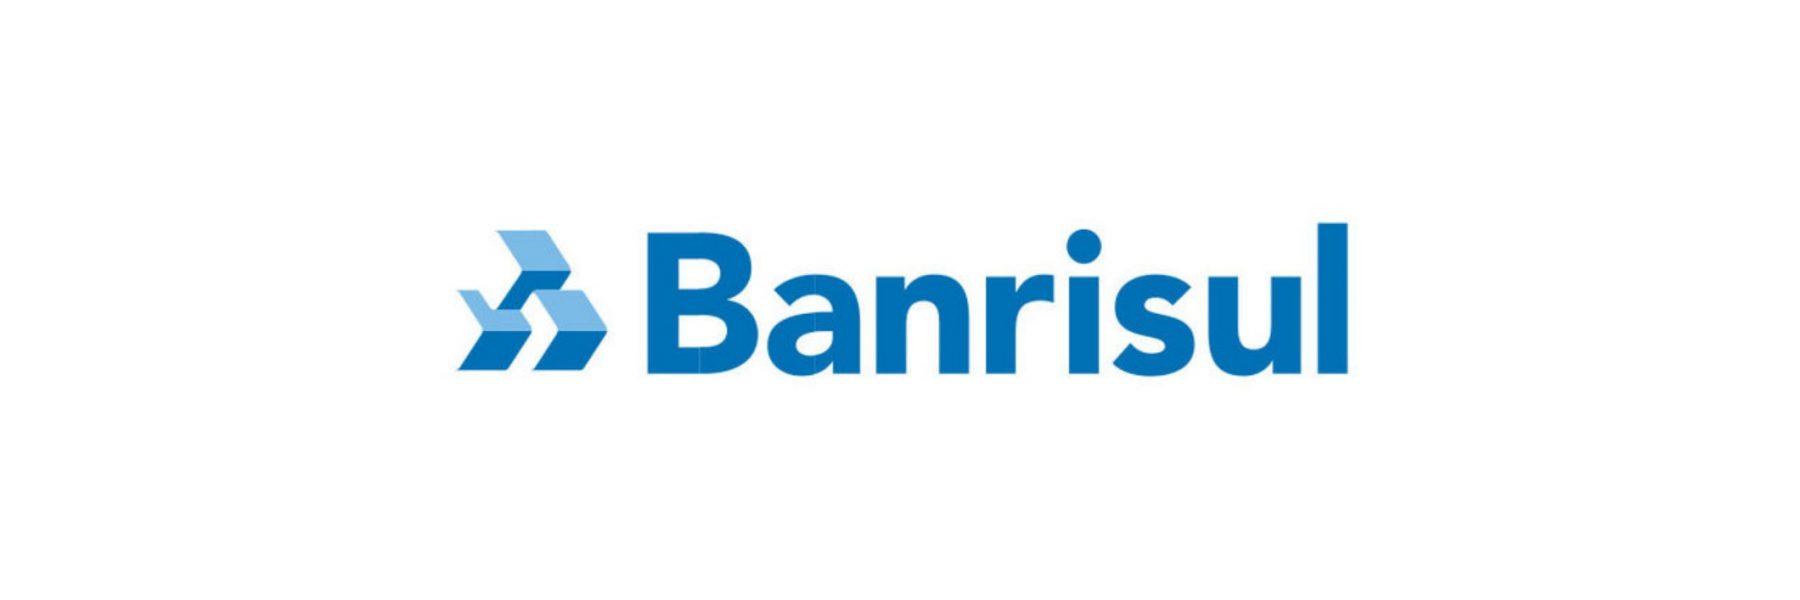 Número do banco Banrisul